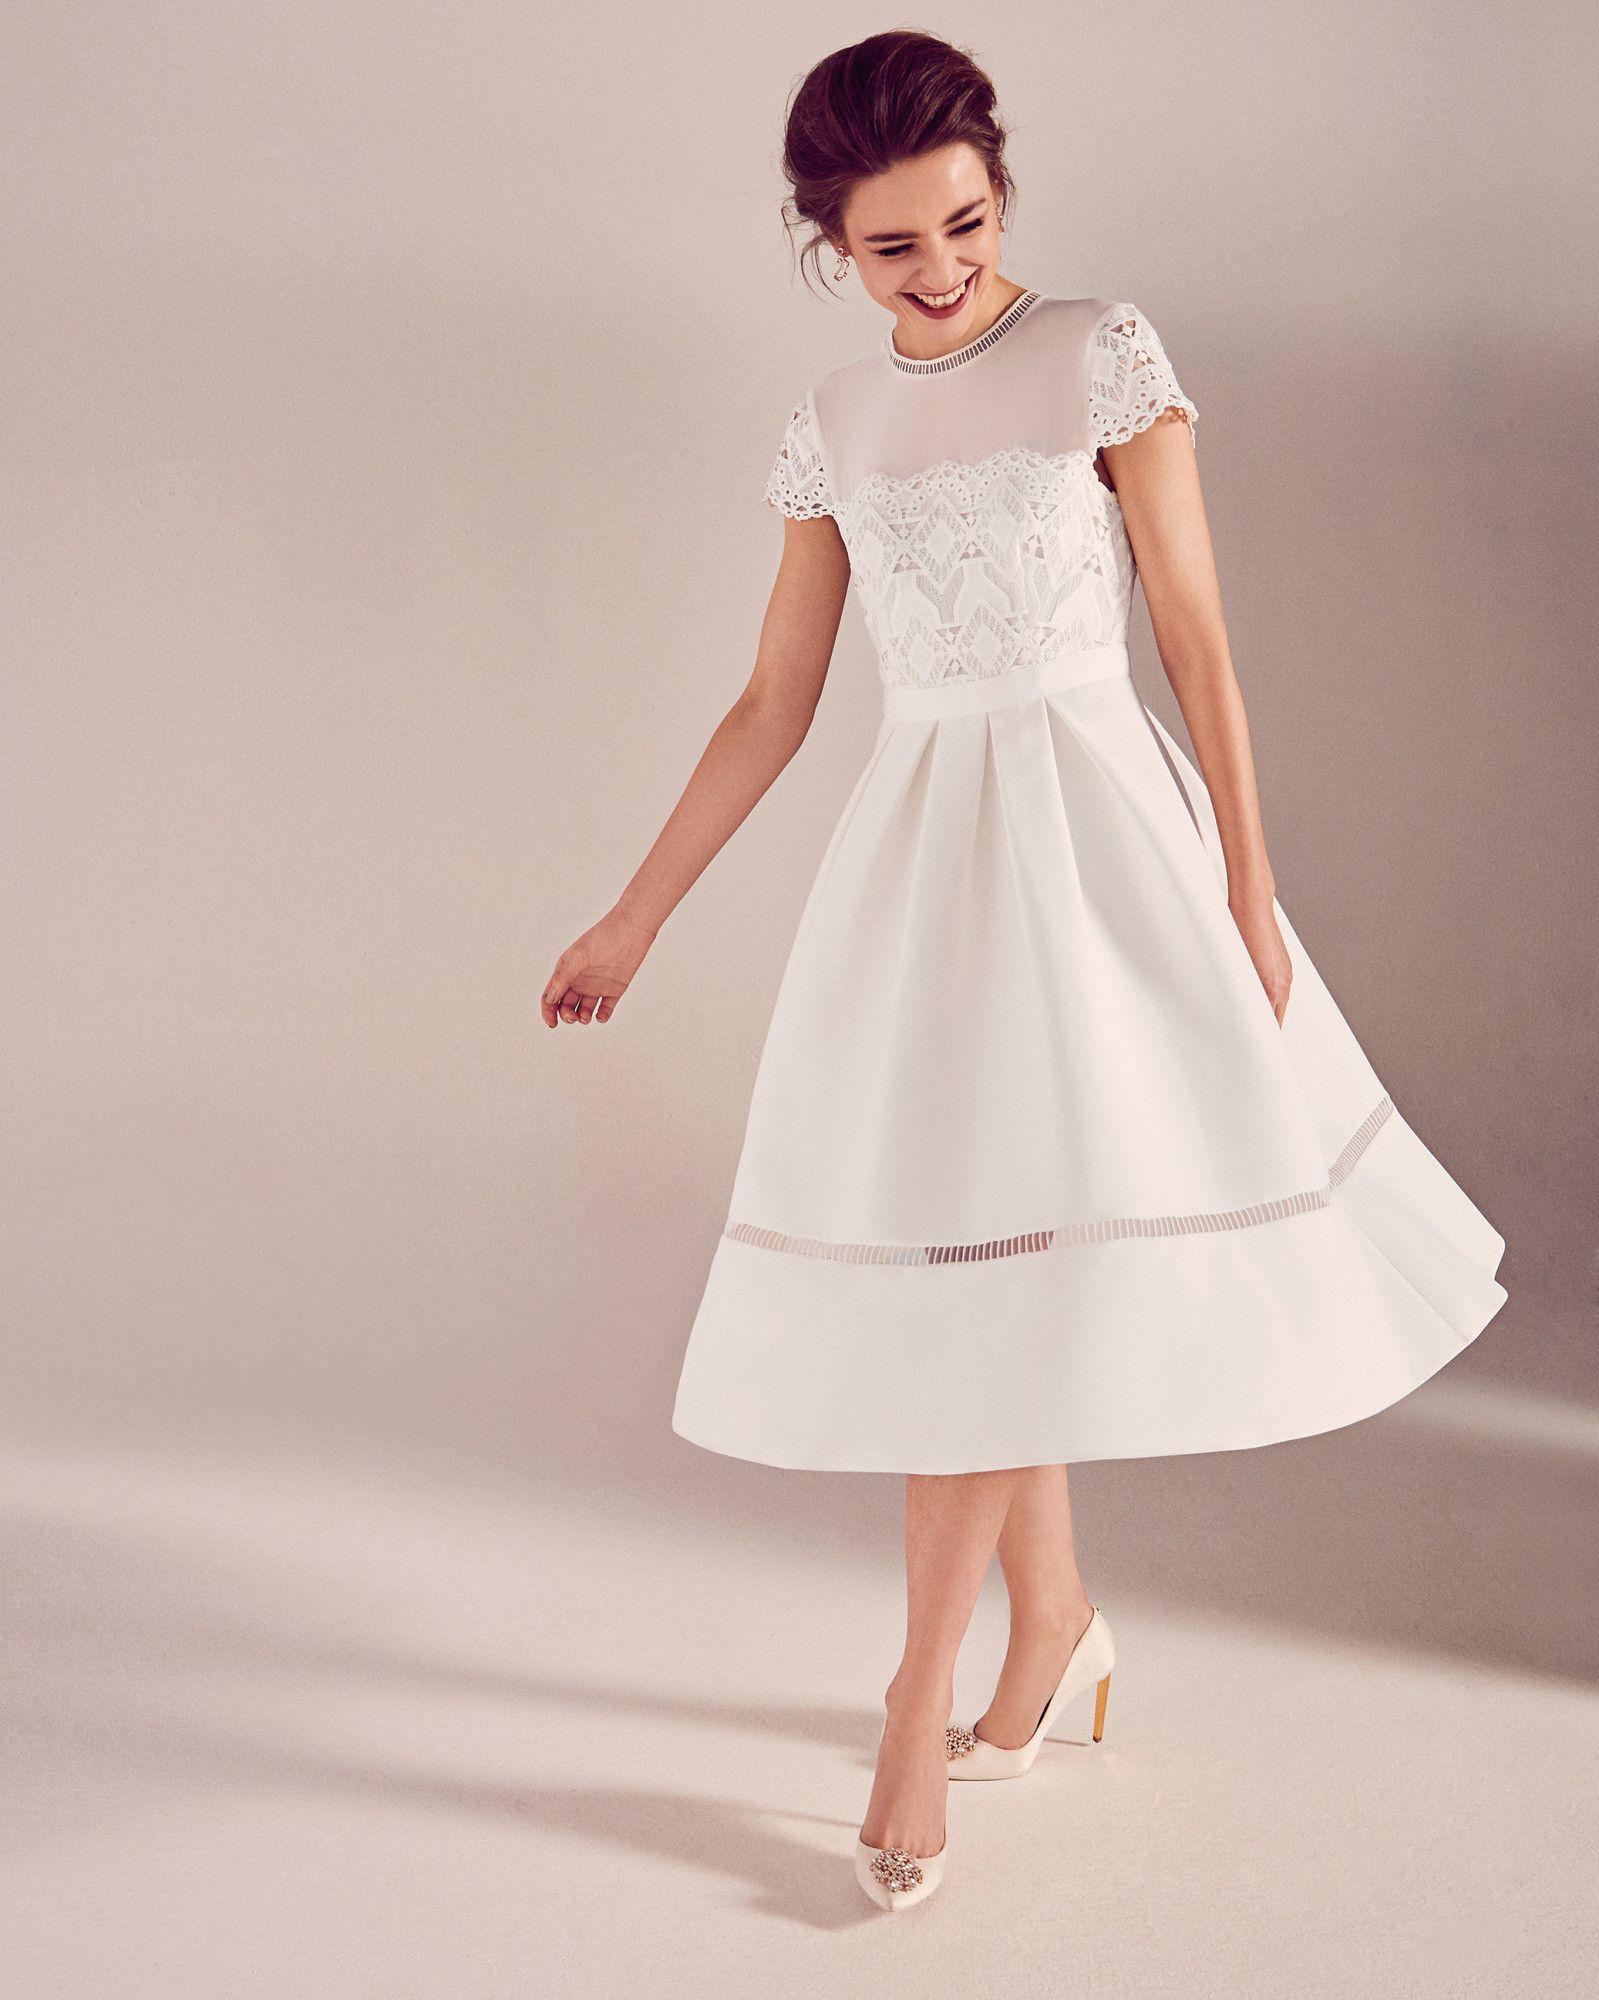 Lace Bodice Midi Dress Ivory Dresses Ted Baker Confirmation Dresses Midi Dress Formal Midi Wedding Dress